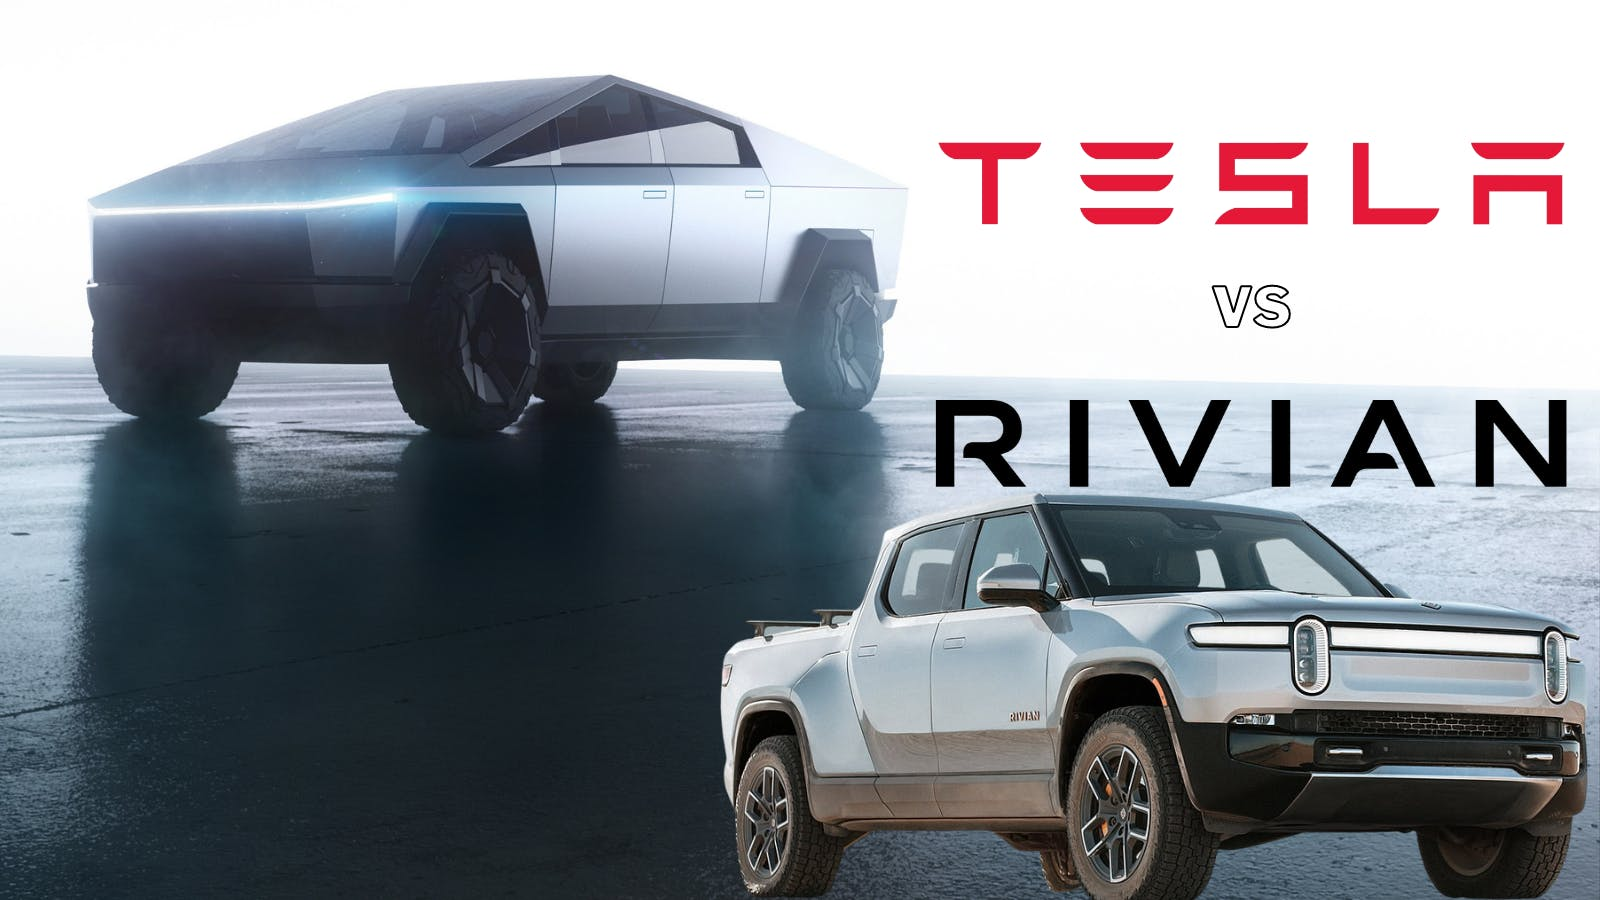 Tesla vs Rivian